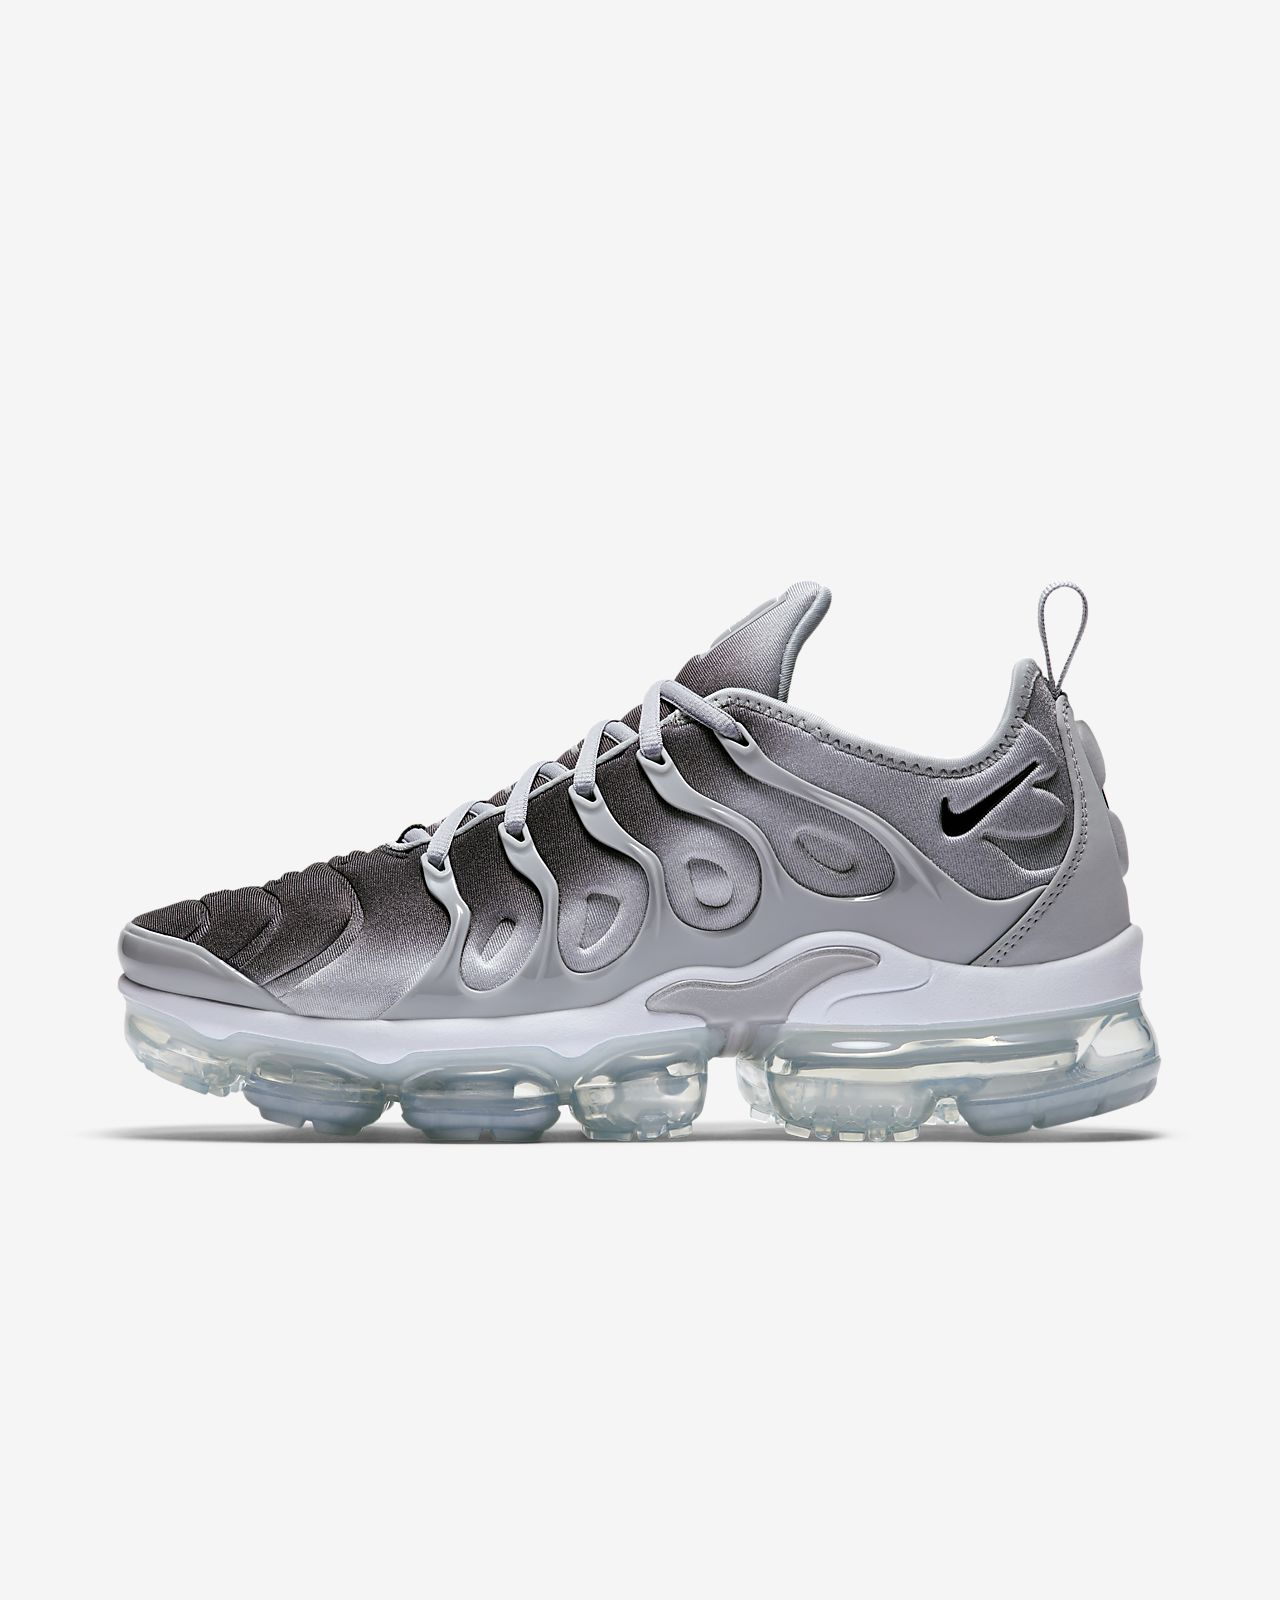 ... Chaussure Nike Air VaporMax Plus pour Homme